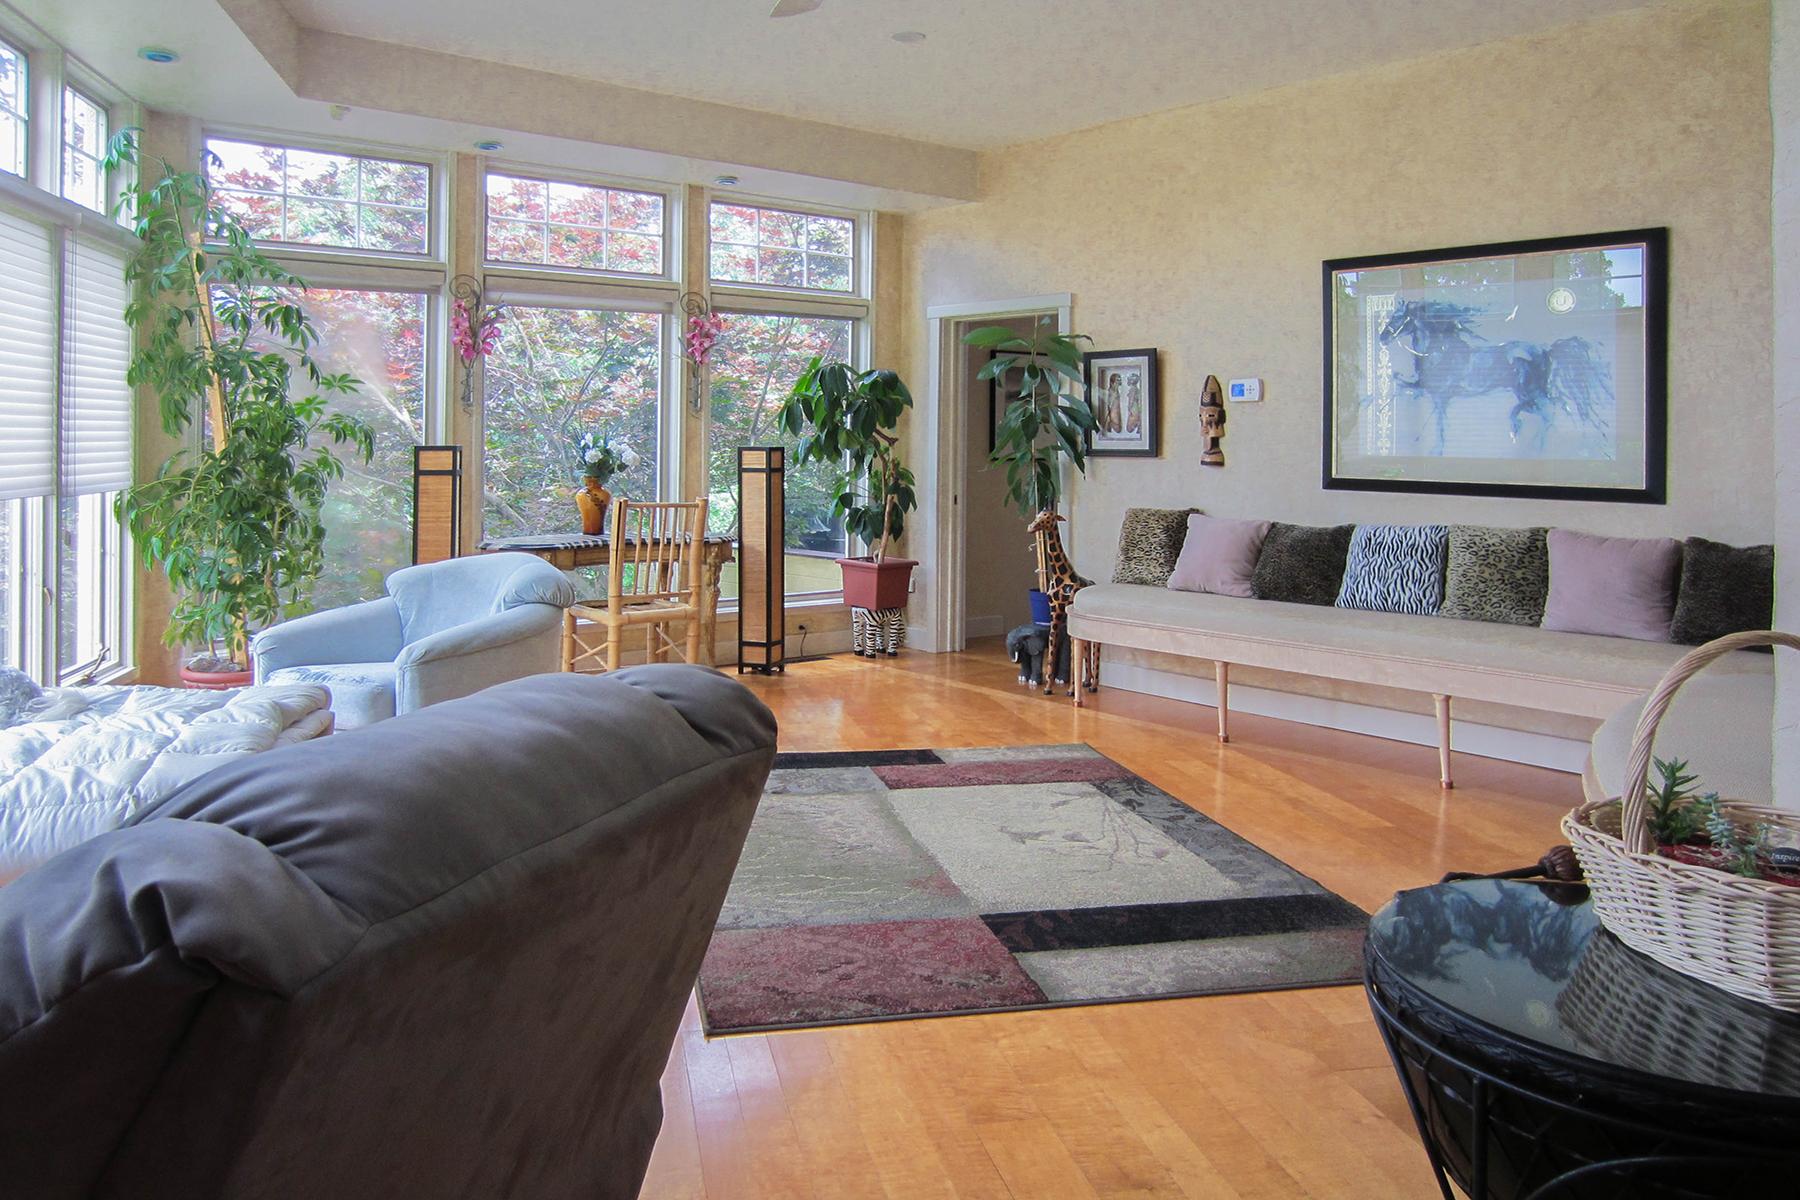 Additional photo for property listing at Mediterranean Villa 70  Coons Rd Troy, Нью-Йорк 12180 Соединенные Штаты